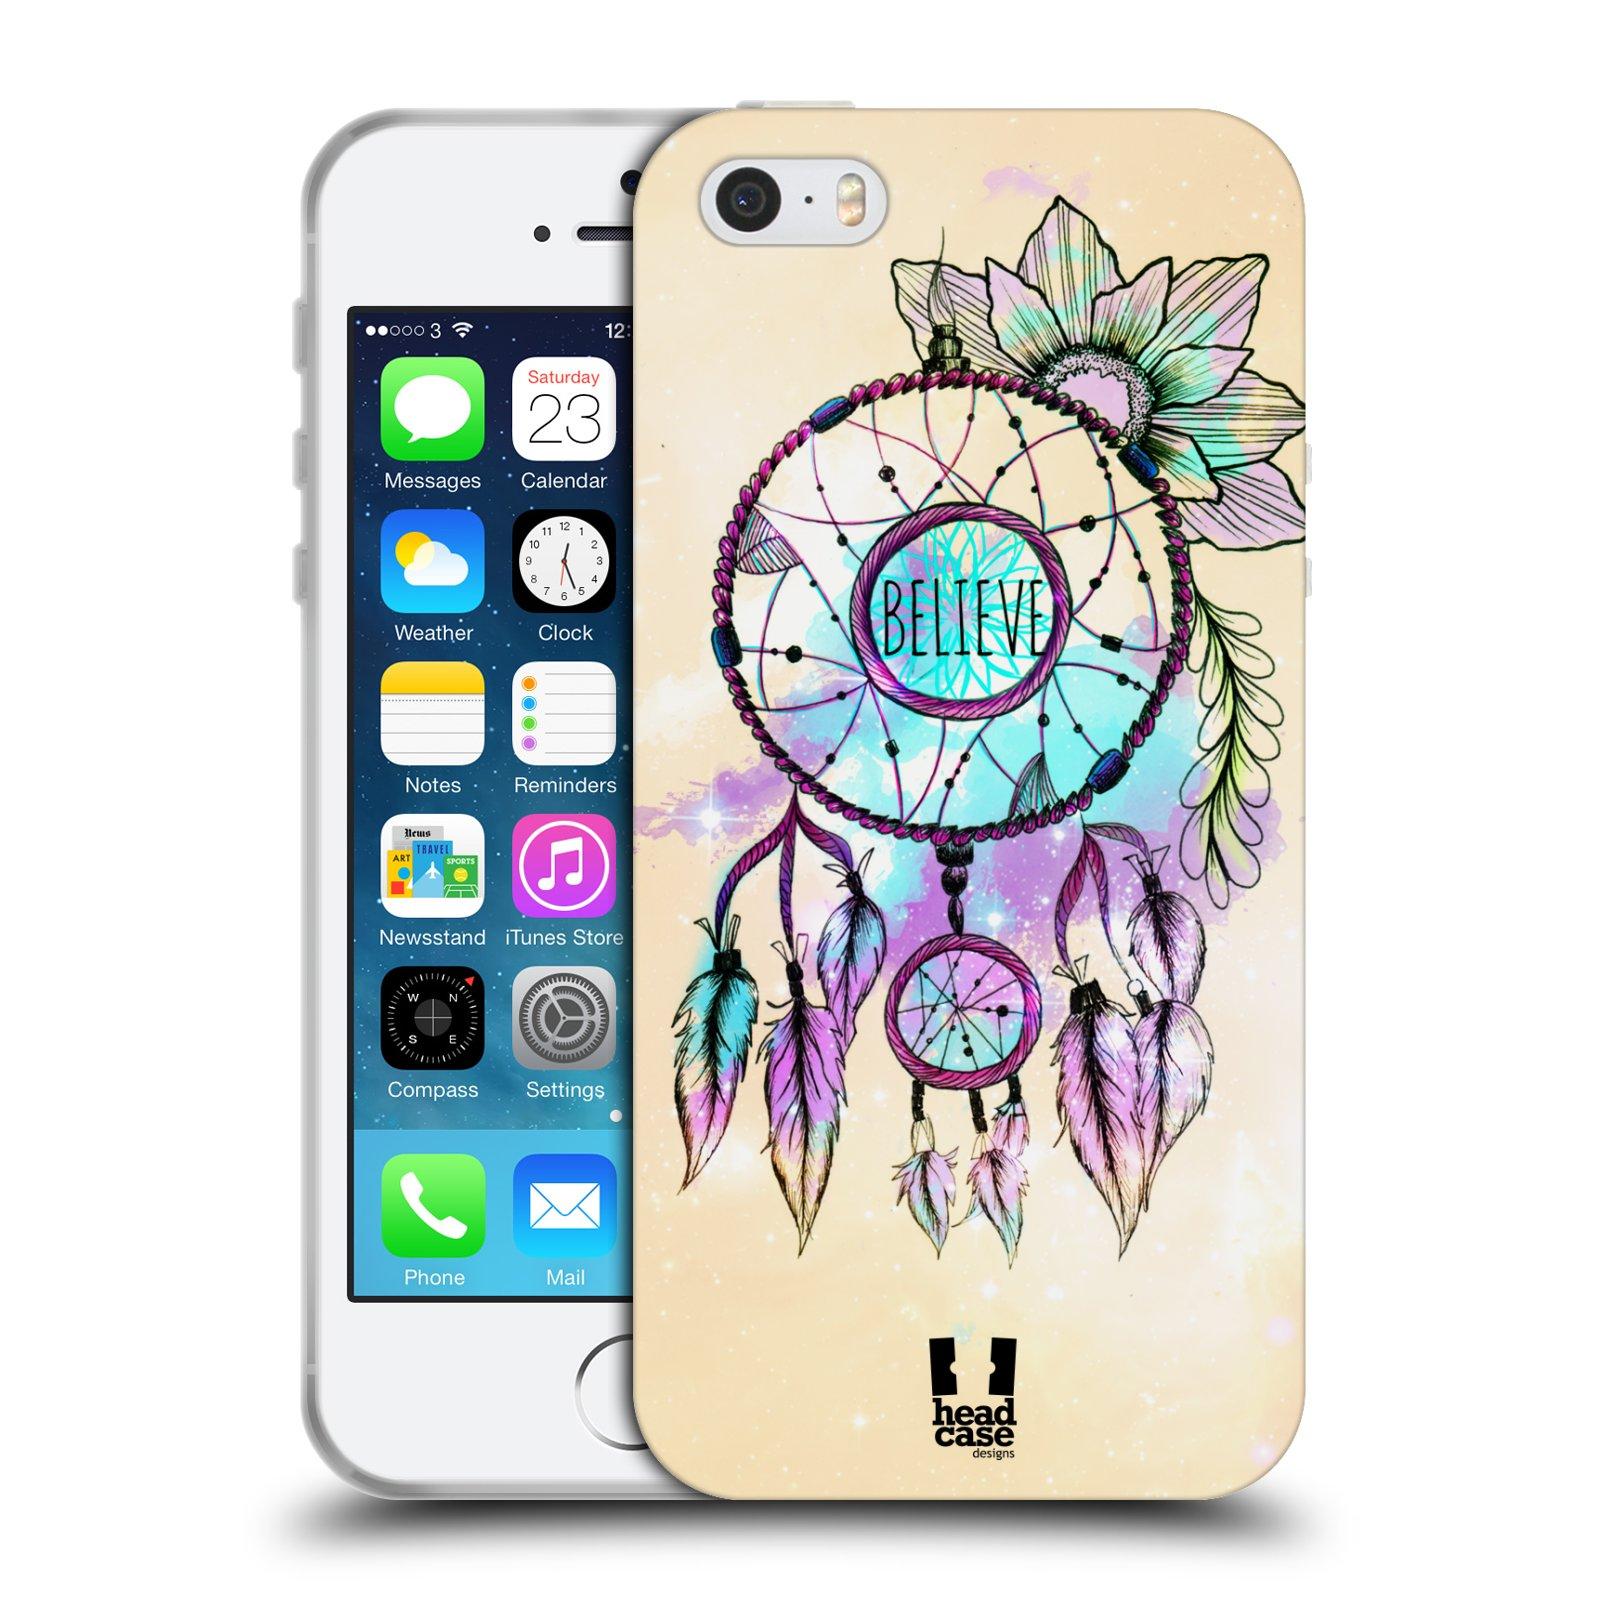 Silikonové pouzdro na mobil Apple iPhone 5, 5S, SE - Head Case - MIX BELIEVE